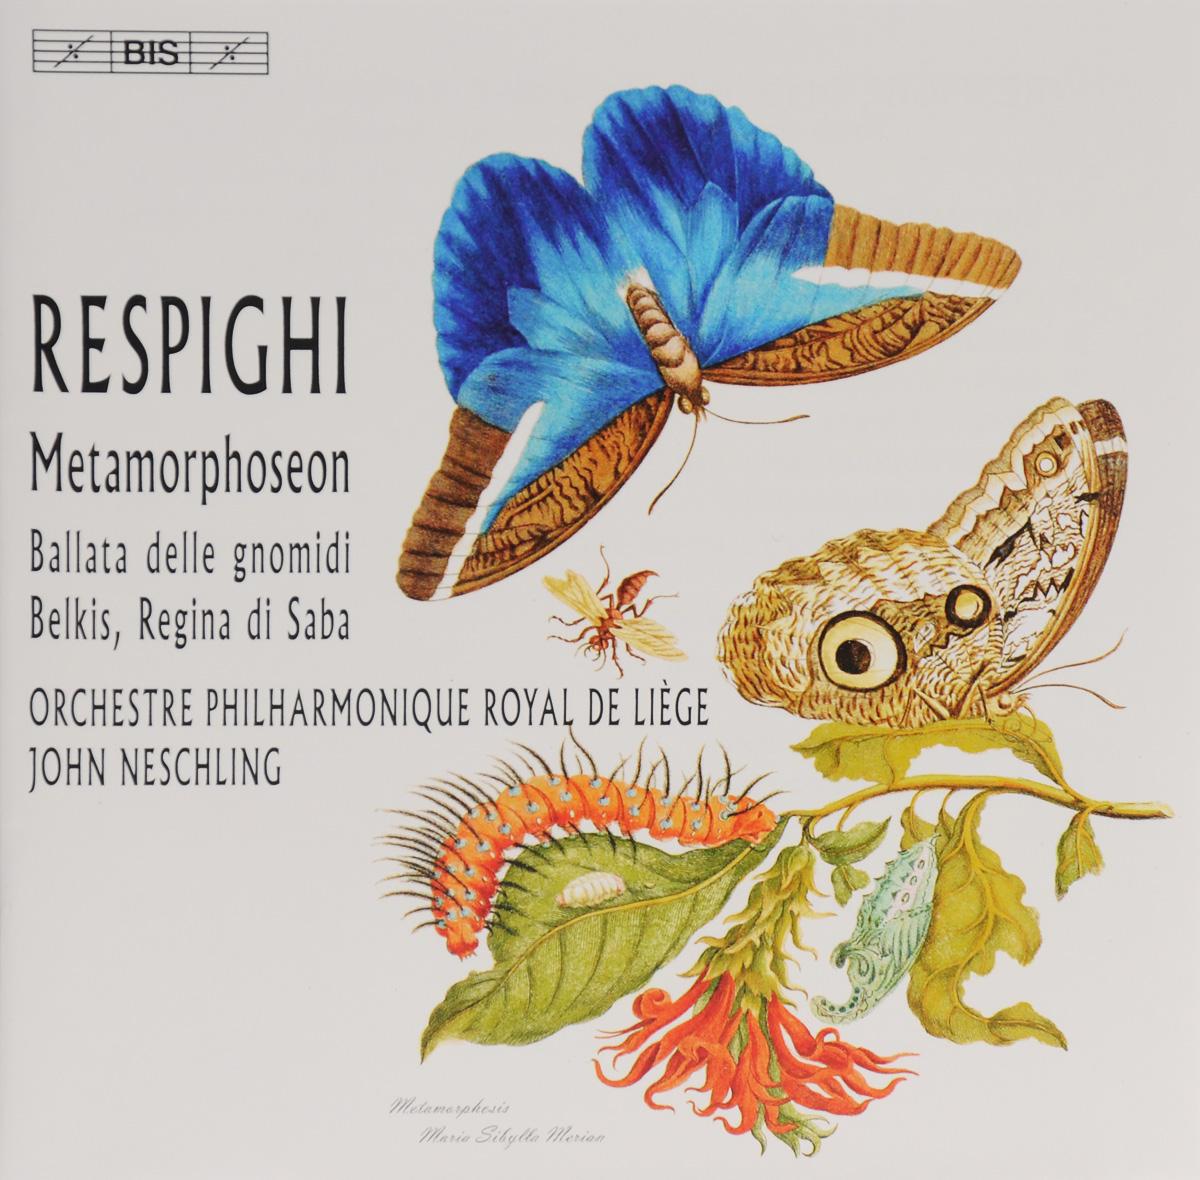 John Neschling. Respighi. Metamorphoseon / Ballata Delle Gnomidi / Belkis, Regina Di Saba (SACD)